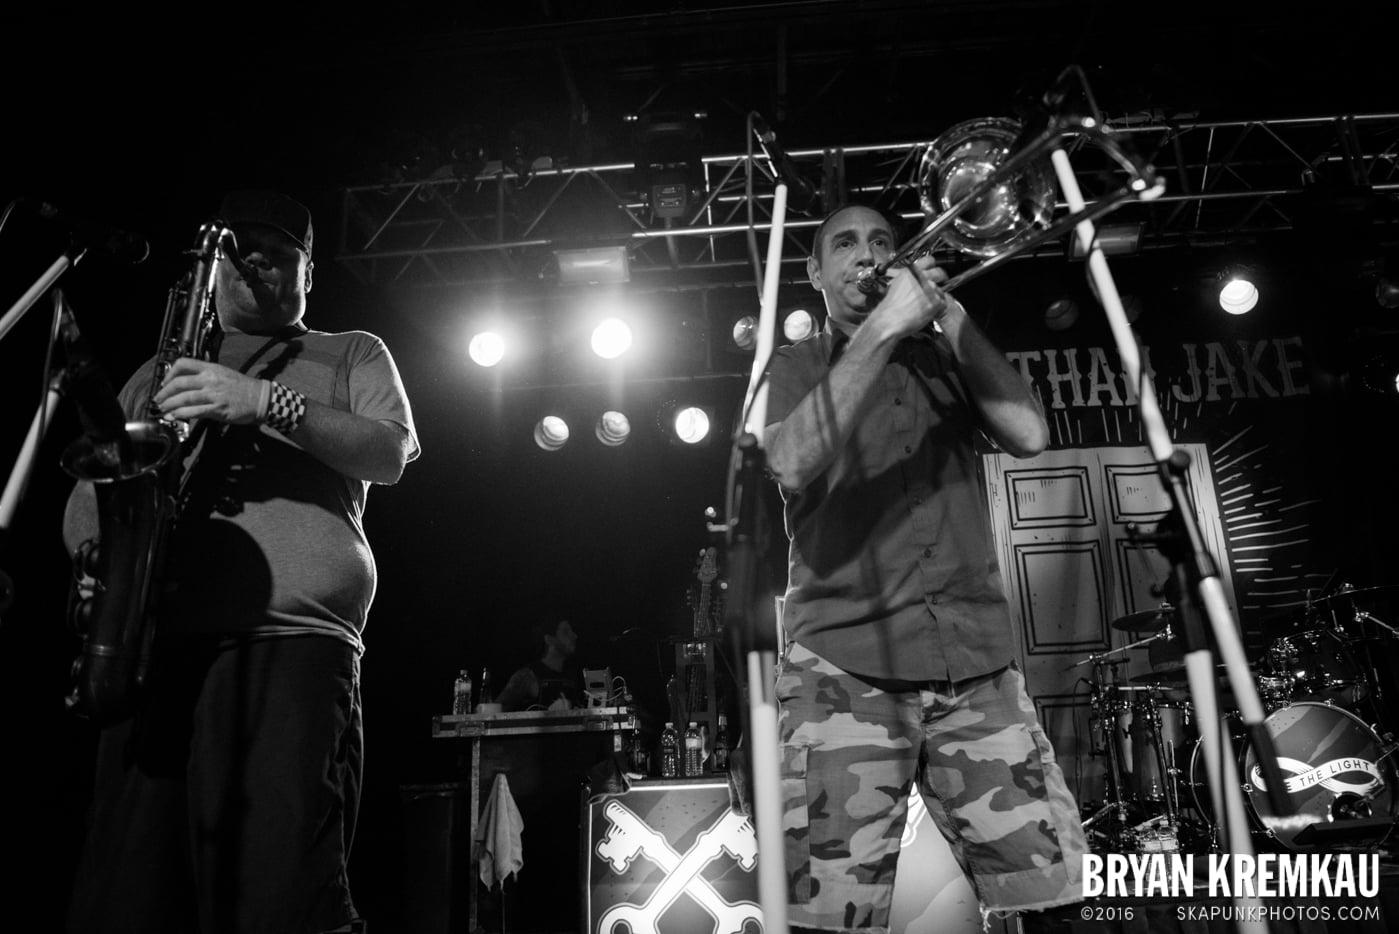 Less Than Jake @ Starland Ballroom, Sayreville, NJ - 11.9.13 (13)